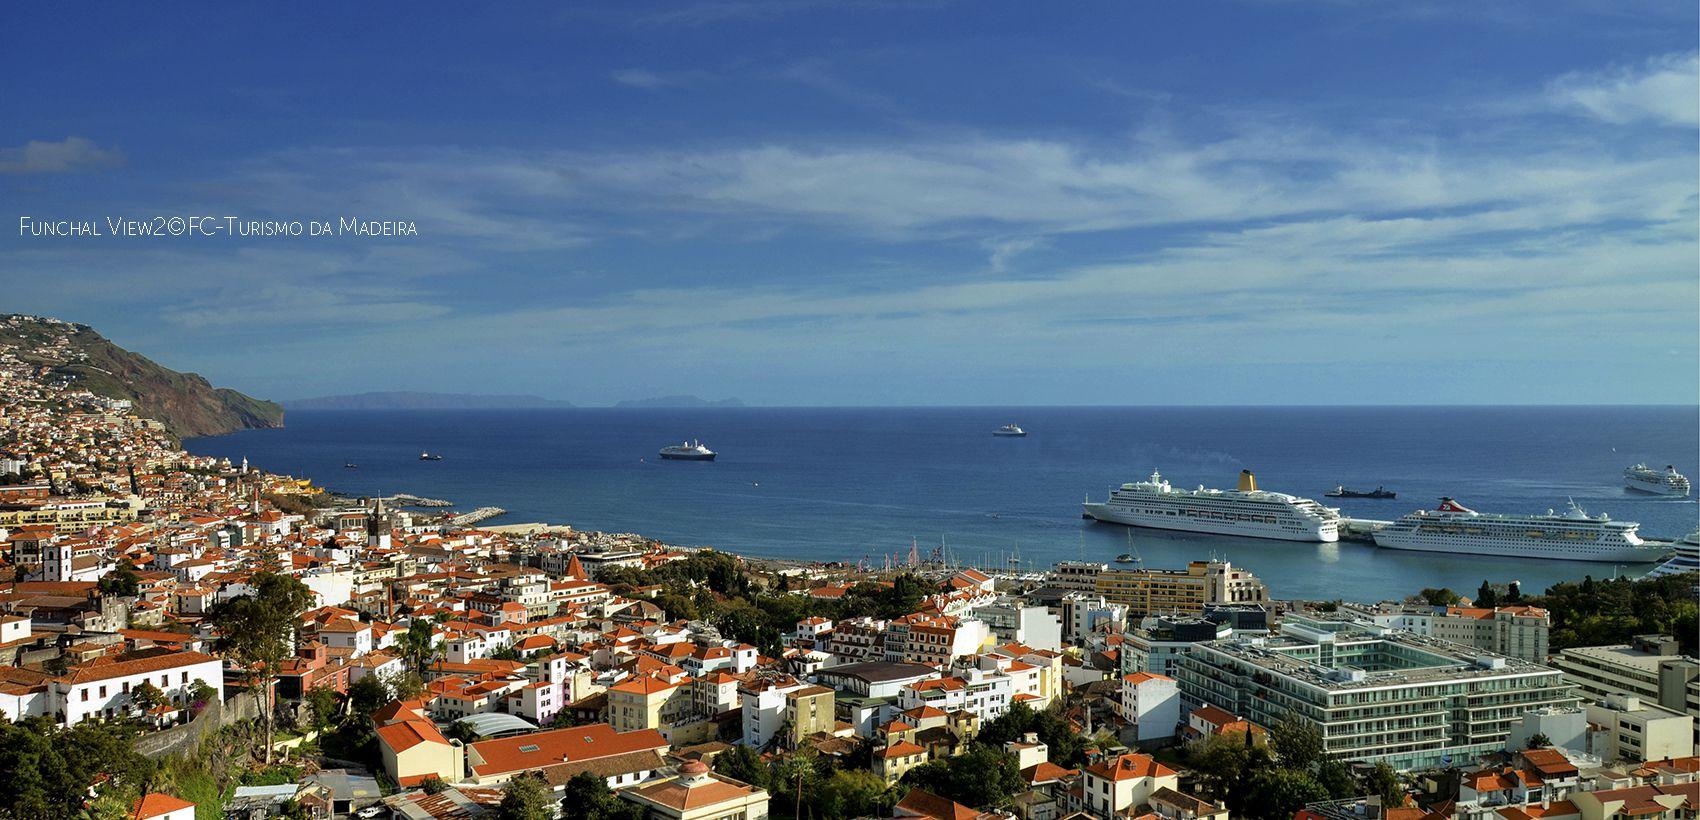 Lisboa/Porto » Funchal: Circuito